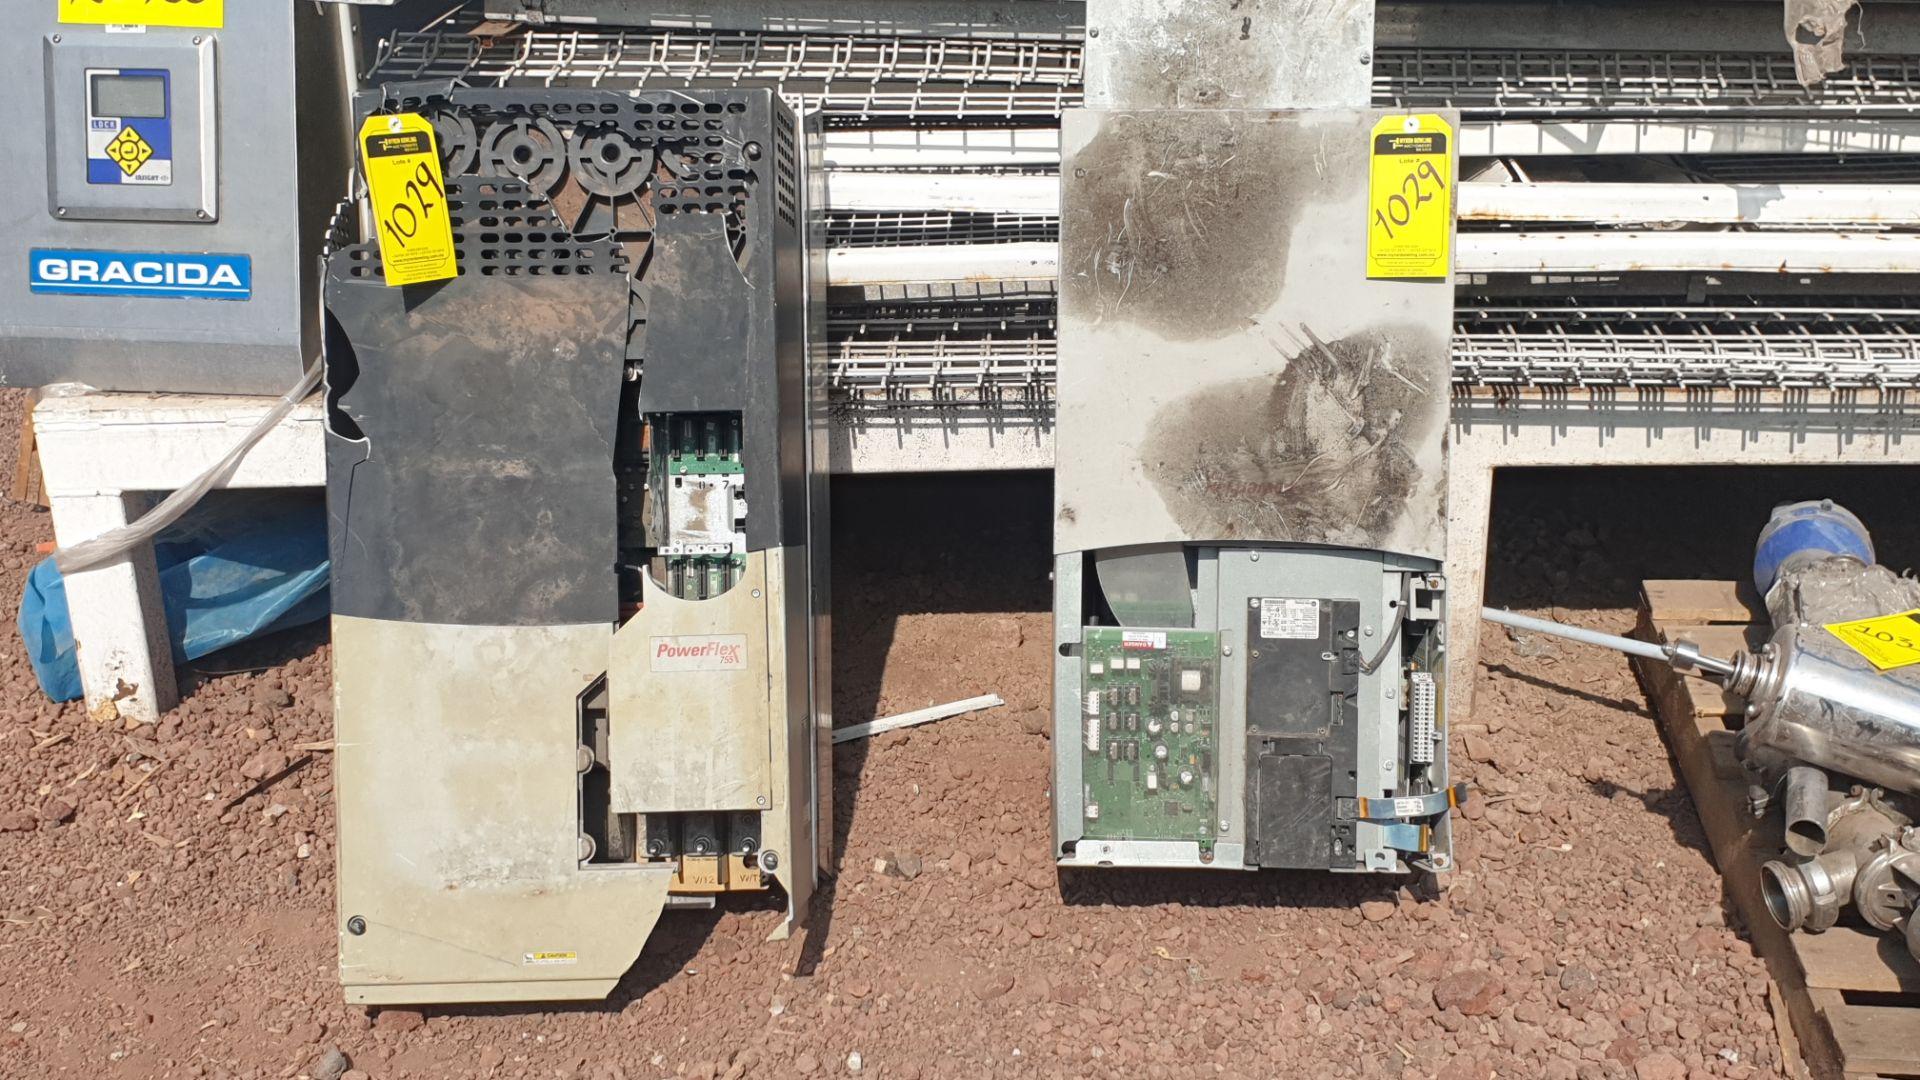 2 Powerflex Variator boards, model 20G1AN, 20BD180A0AYNANC0 - Image 8 of 13